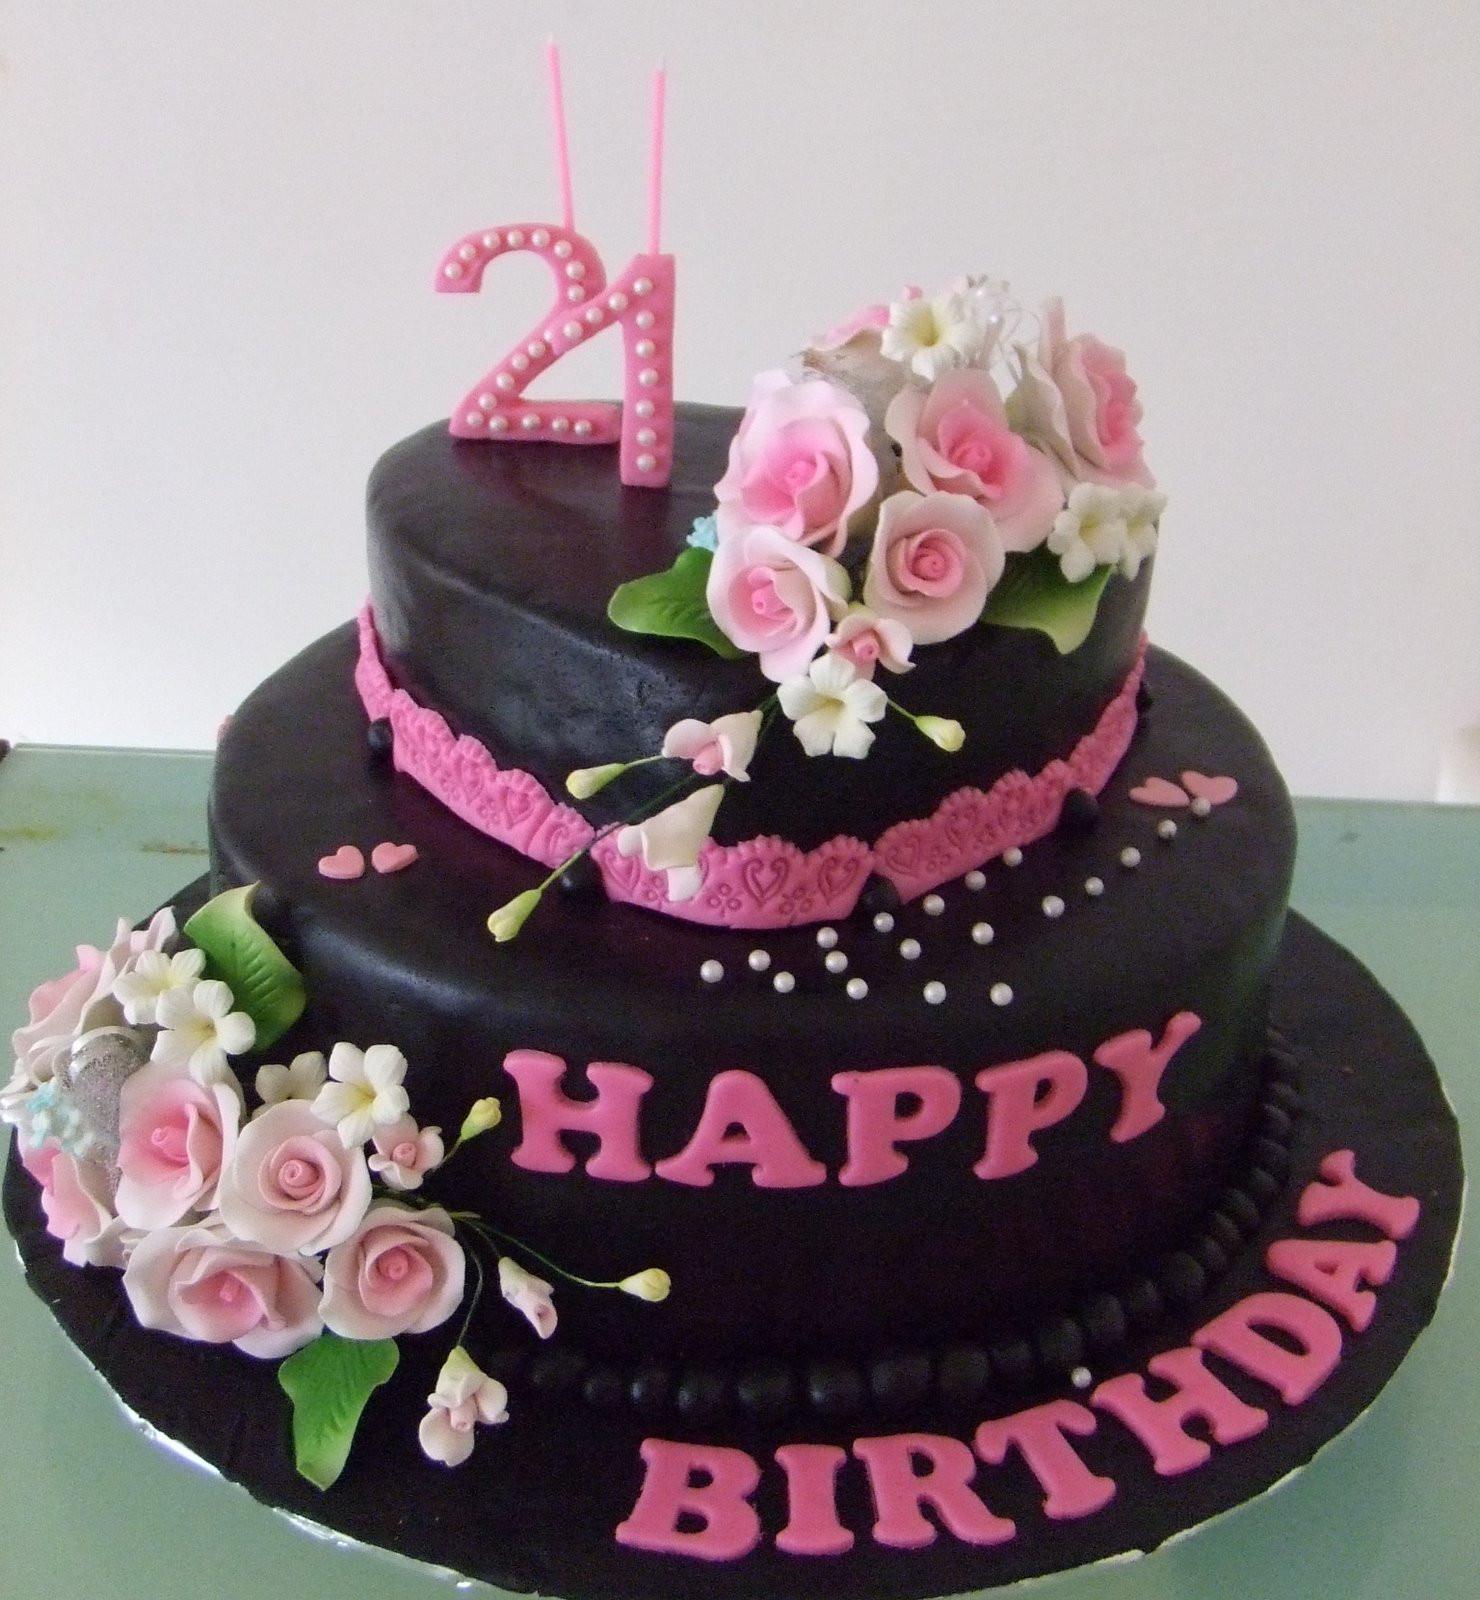 Wedding Cakes Summerville Sc  Charleston Bakery and Deli Birthday & Themed Cakes